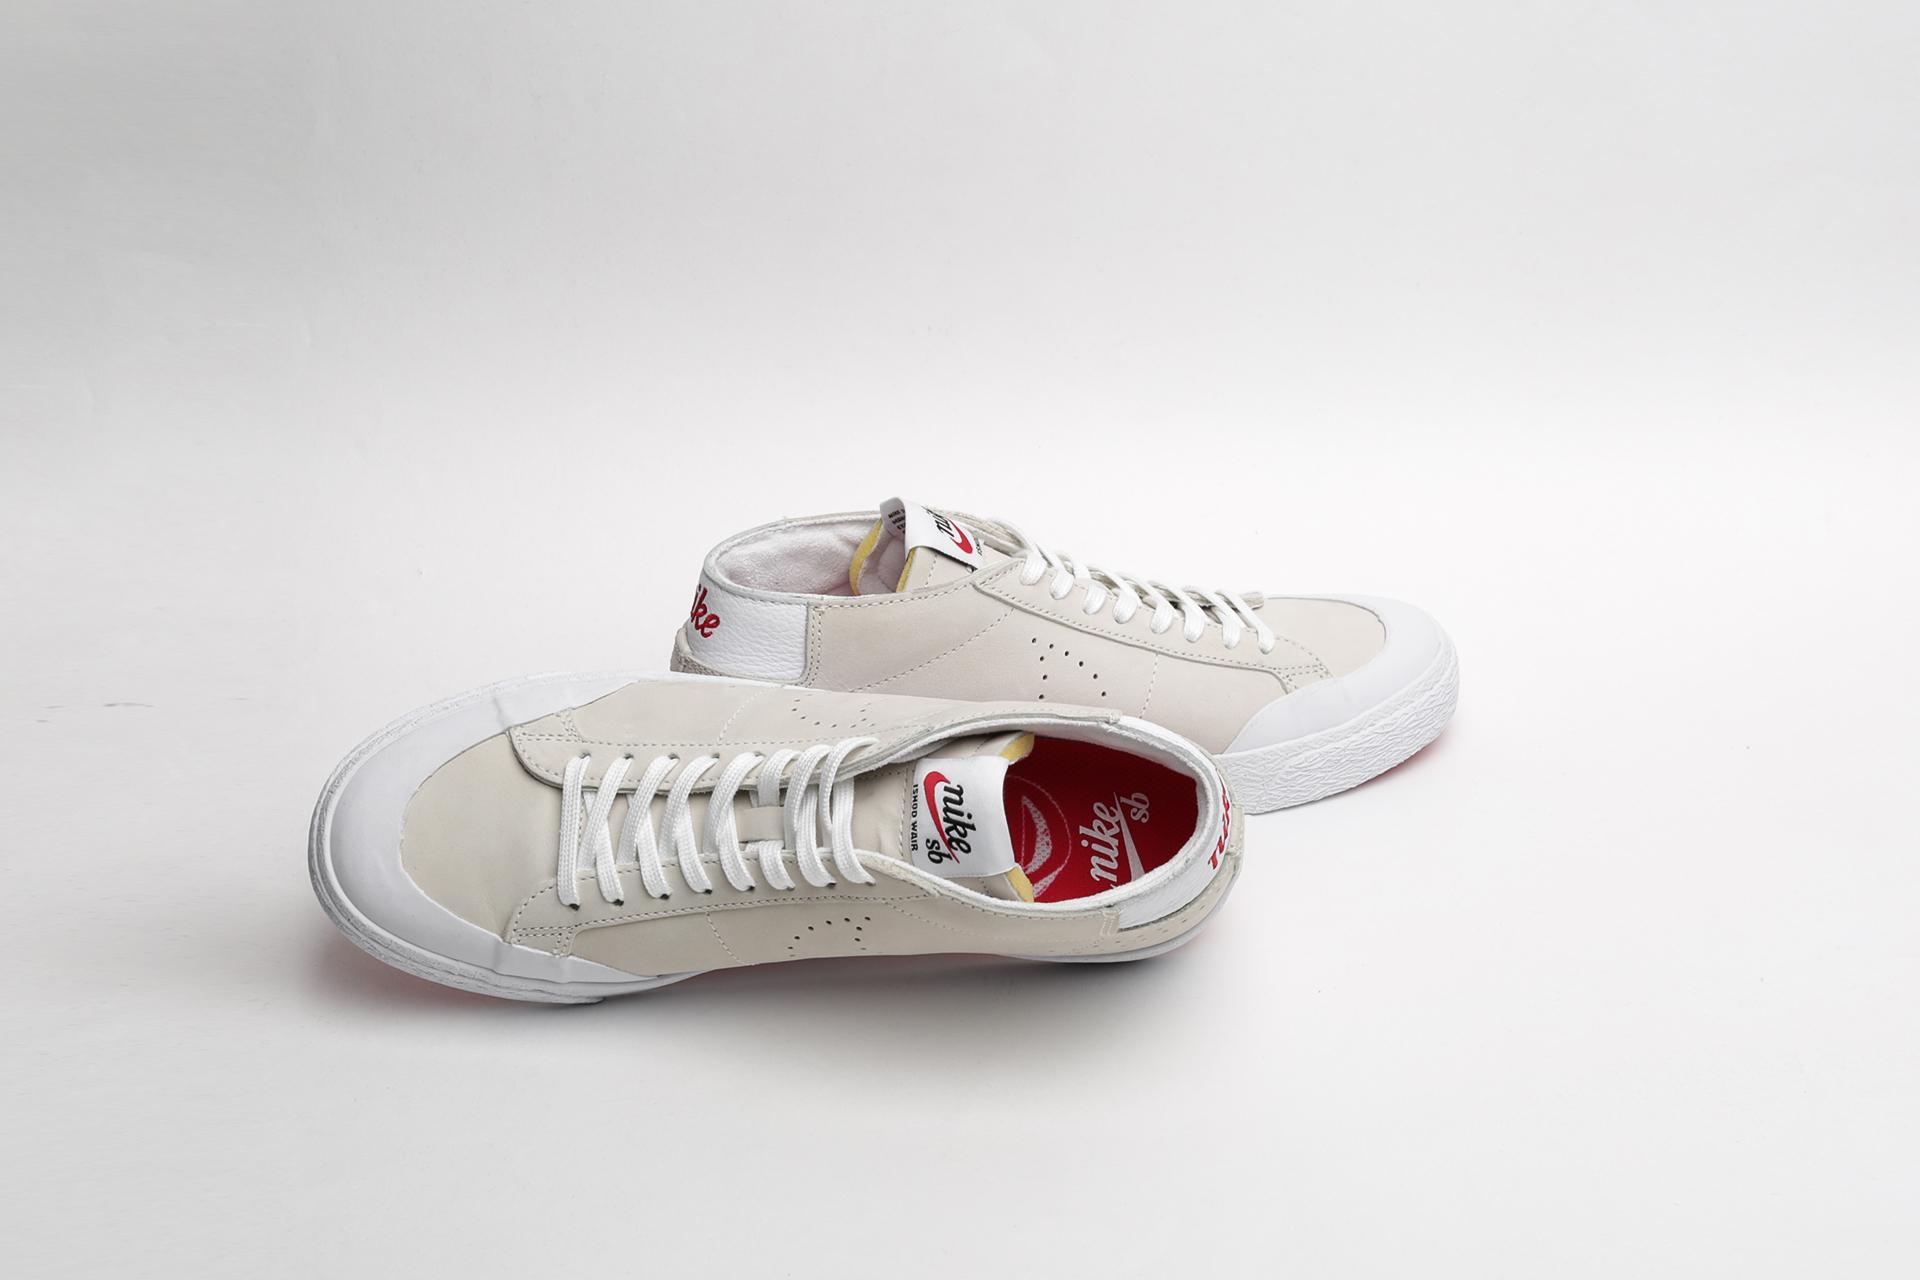 best sneakers 3bc29 236eb Купить бежевые мужские кроссовки SB Zoom Blazer Chukka XT QS ...